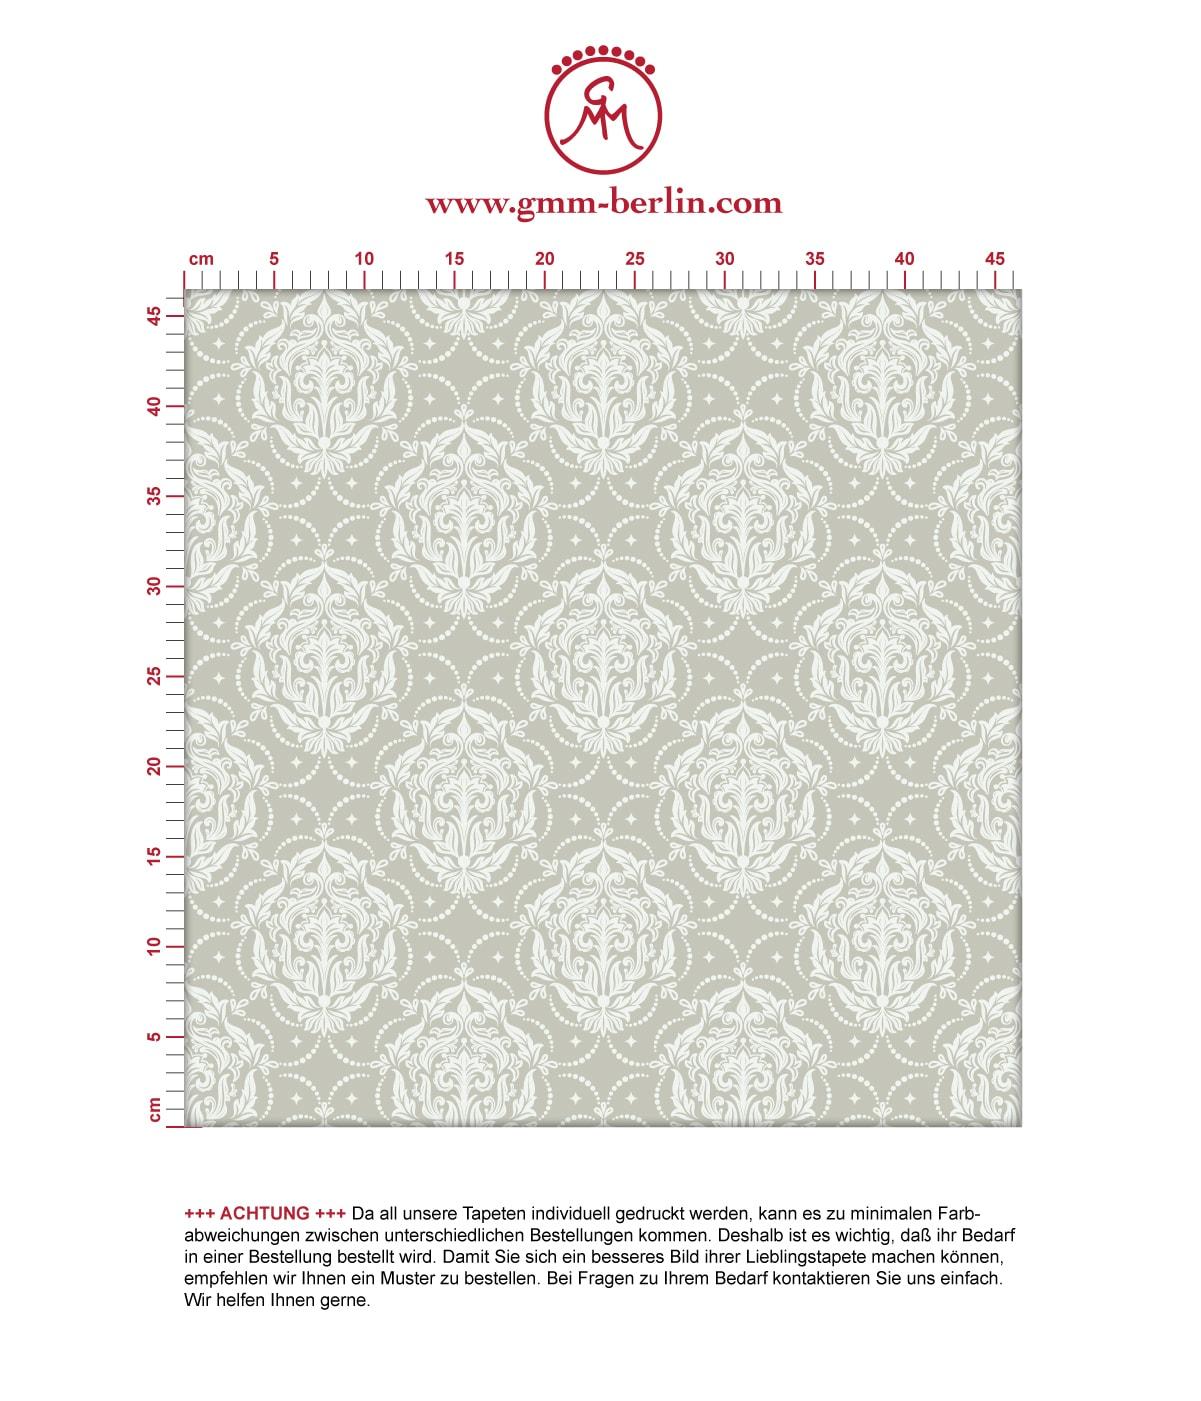 Graue Ornamenttapete My Castle Damast Muster - Design Tapete für Flur, Büro. Aus dem GMM-BERLIN.com Sortiment: Schöne Tapeten in weiss